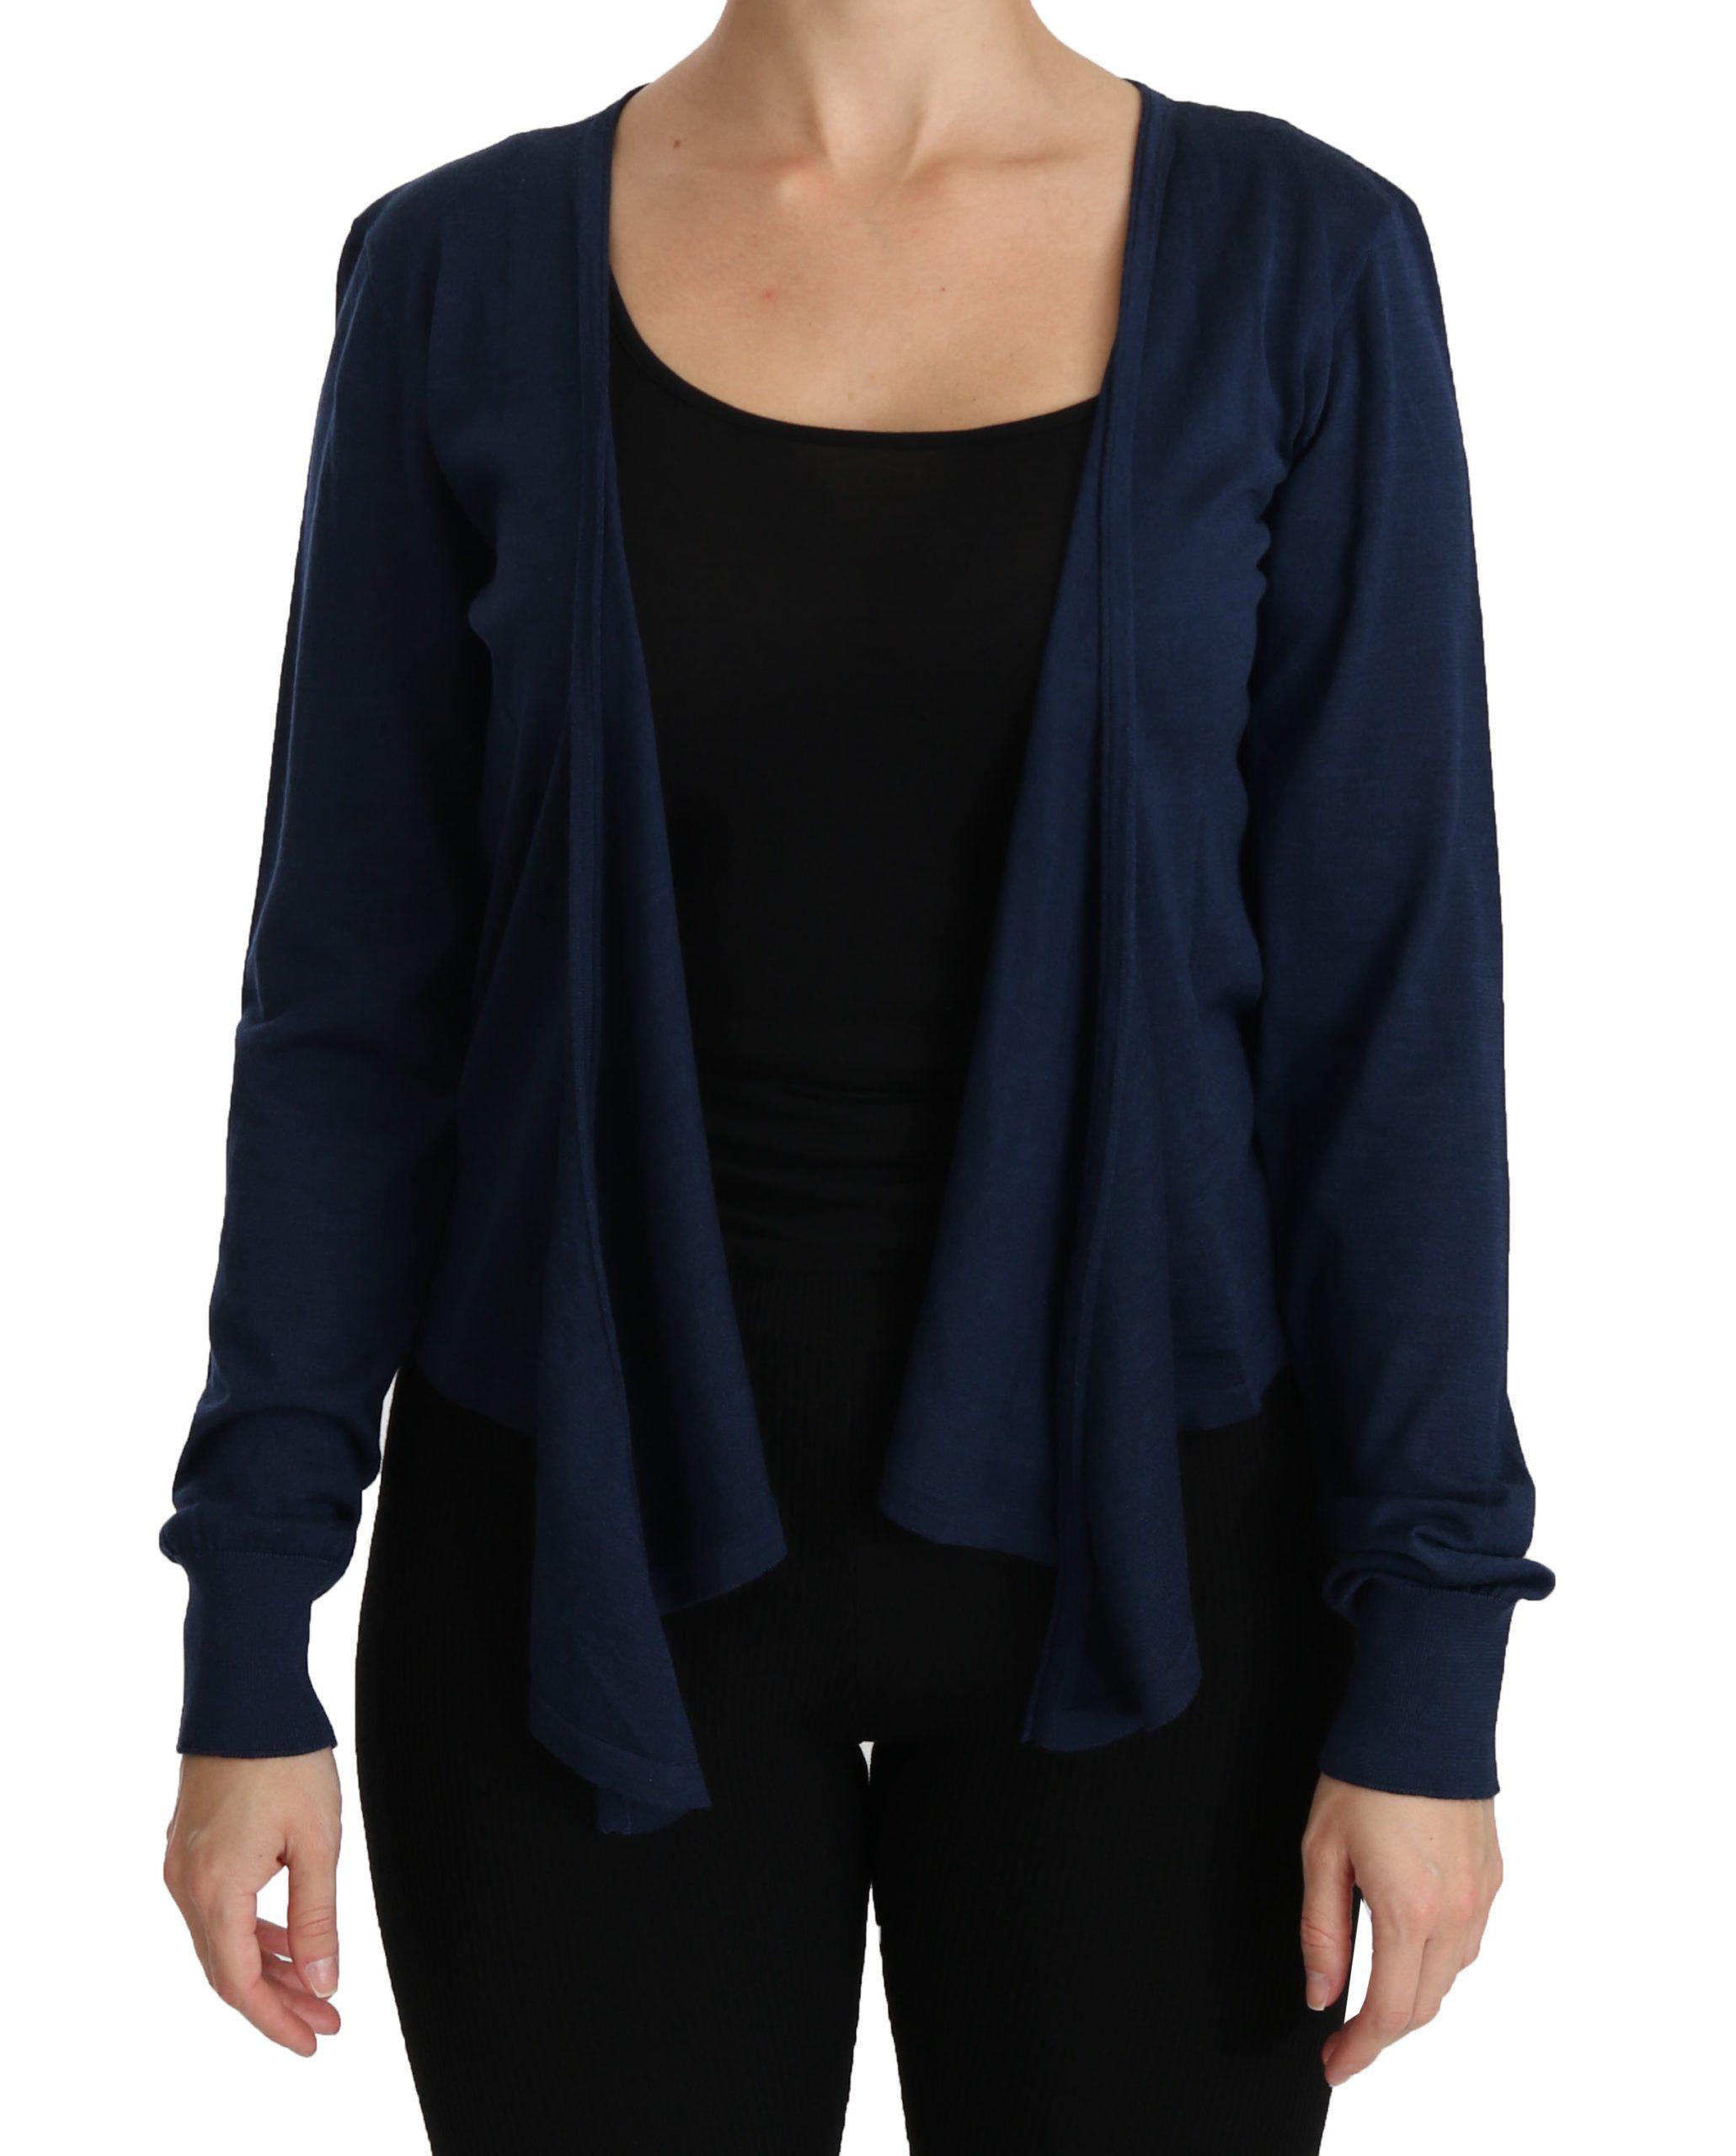 Dolce & Gabbana Women's LS Cashmere Cardigan Blue TSH4253 - IT46 XL